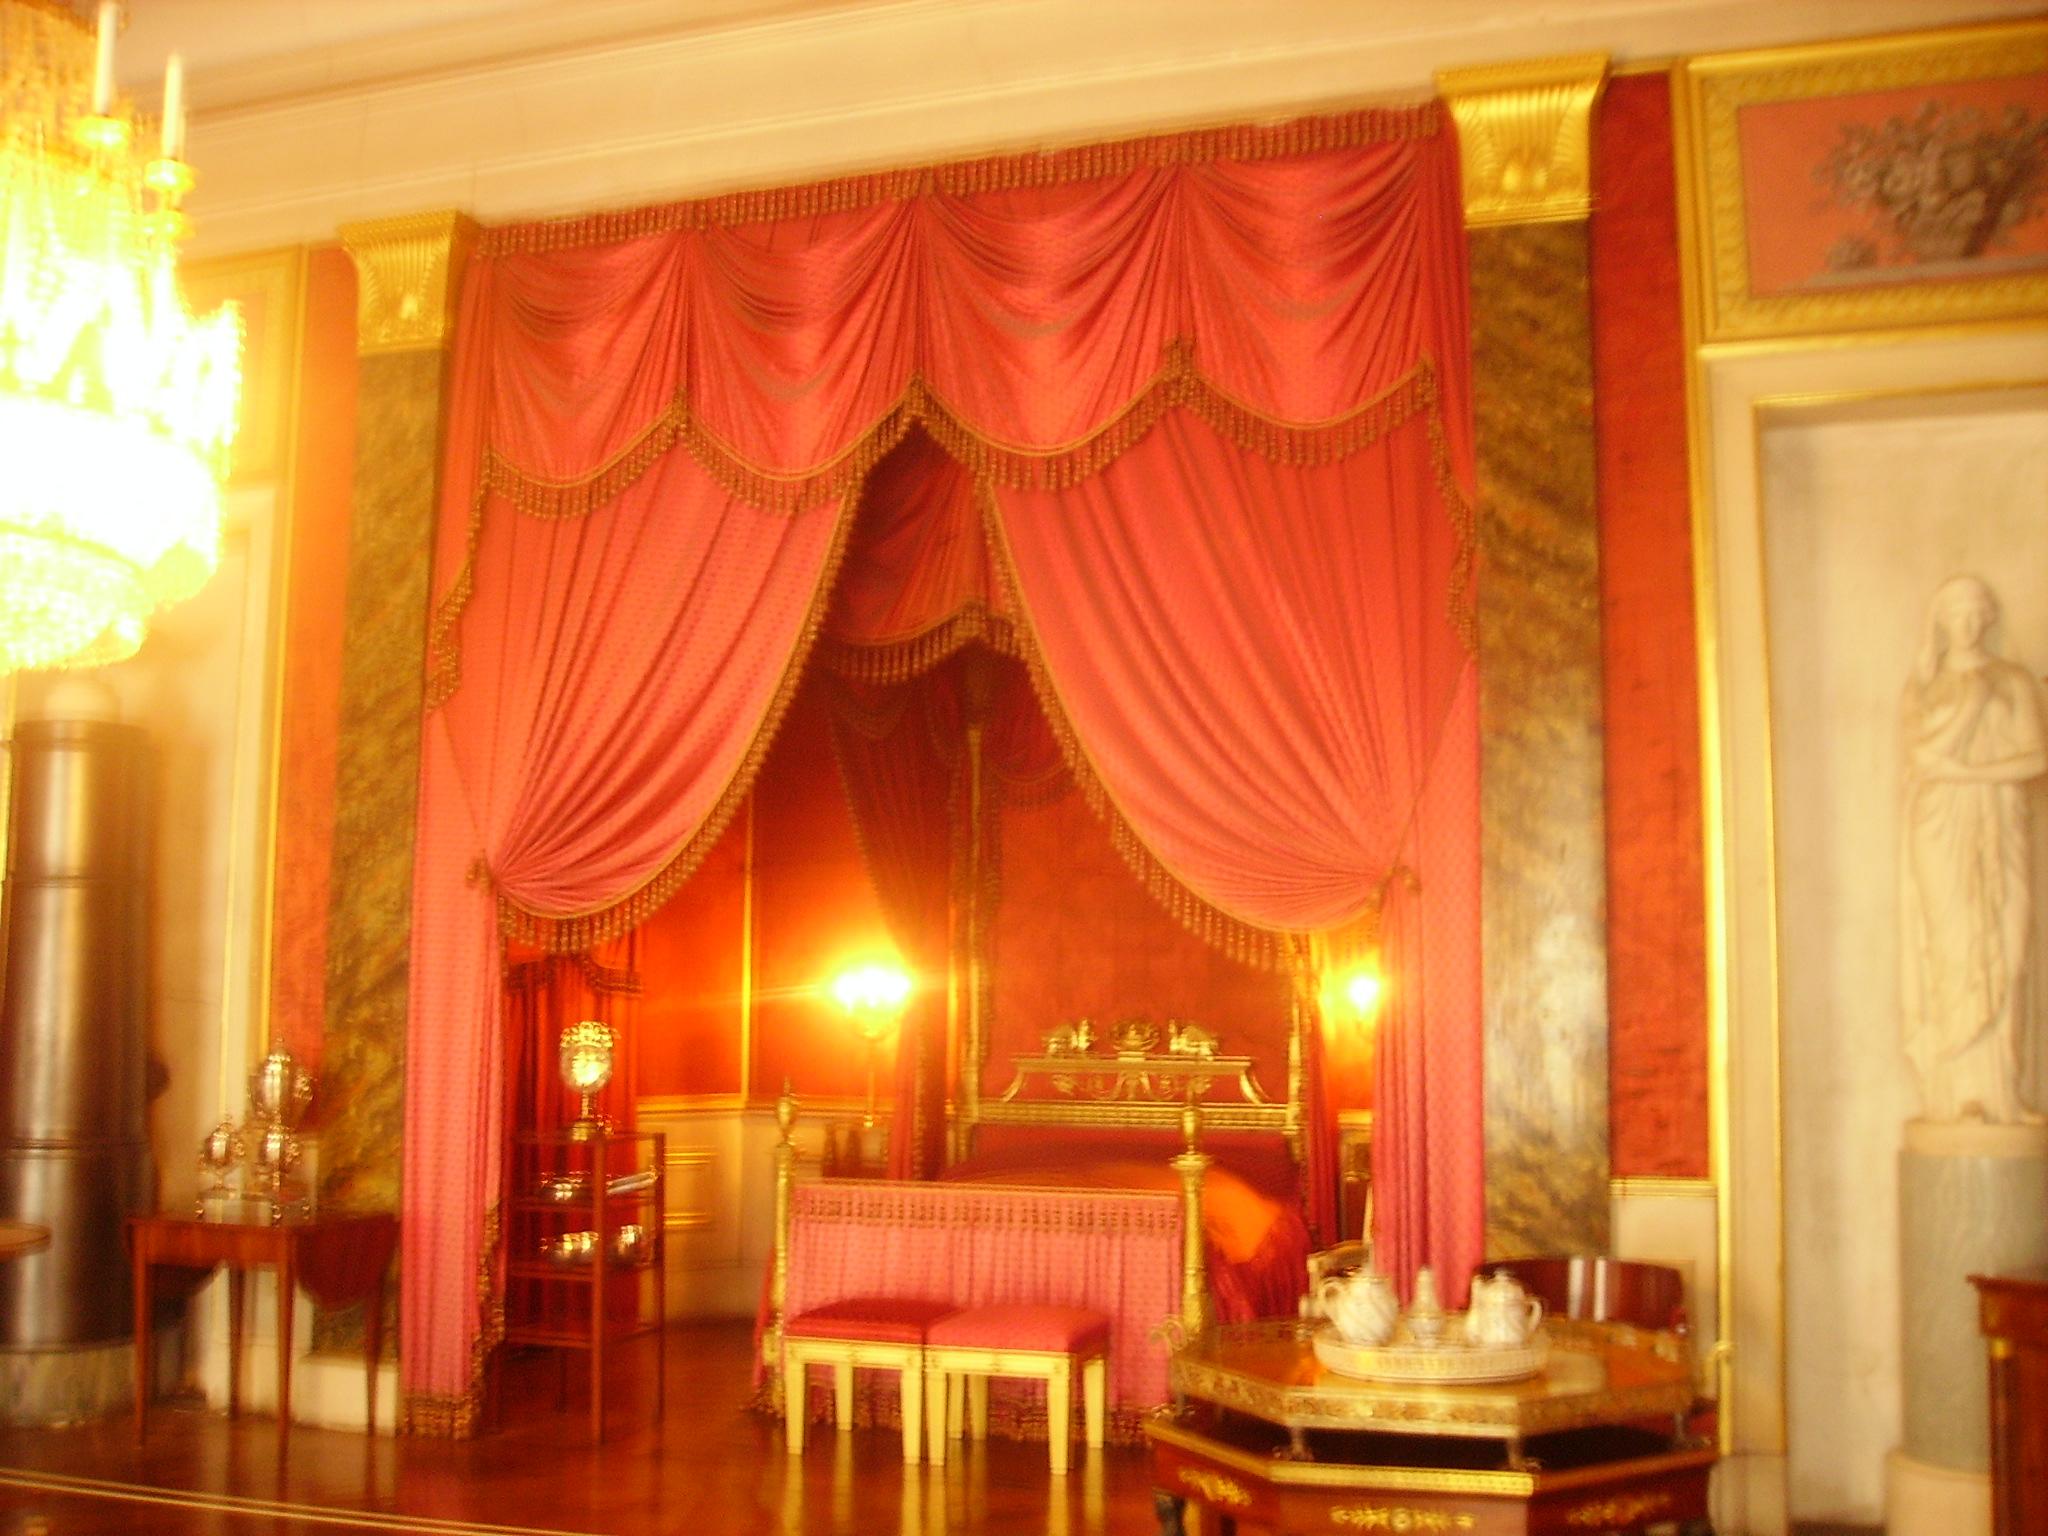 Schloss schlafzimmer badezimmer schlafzimmer sessel - Ludwig badezimmer ...